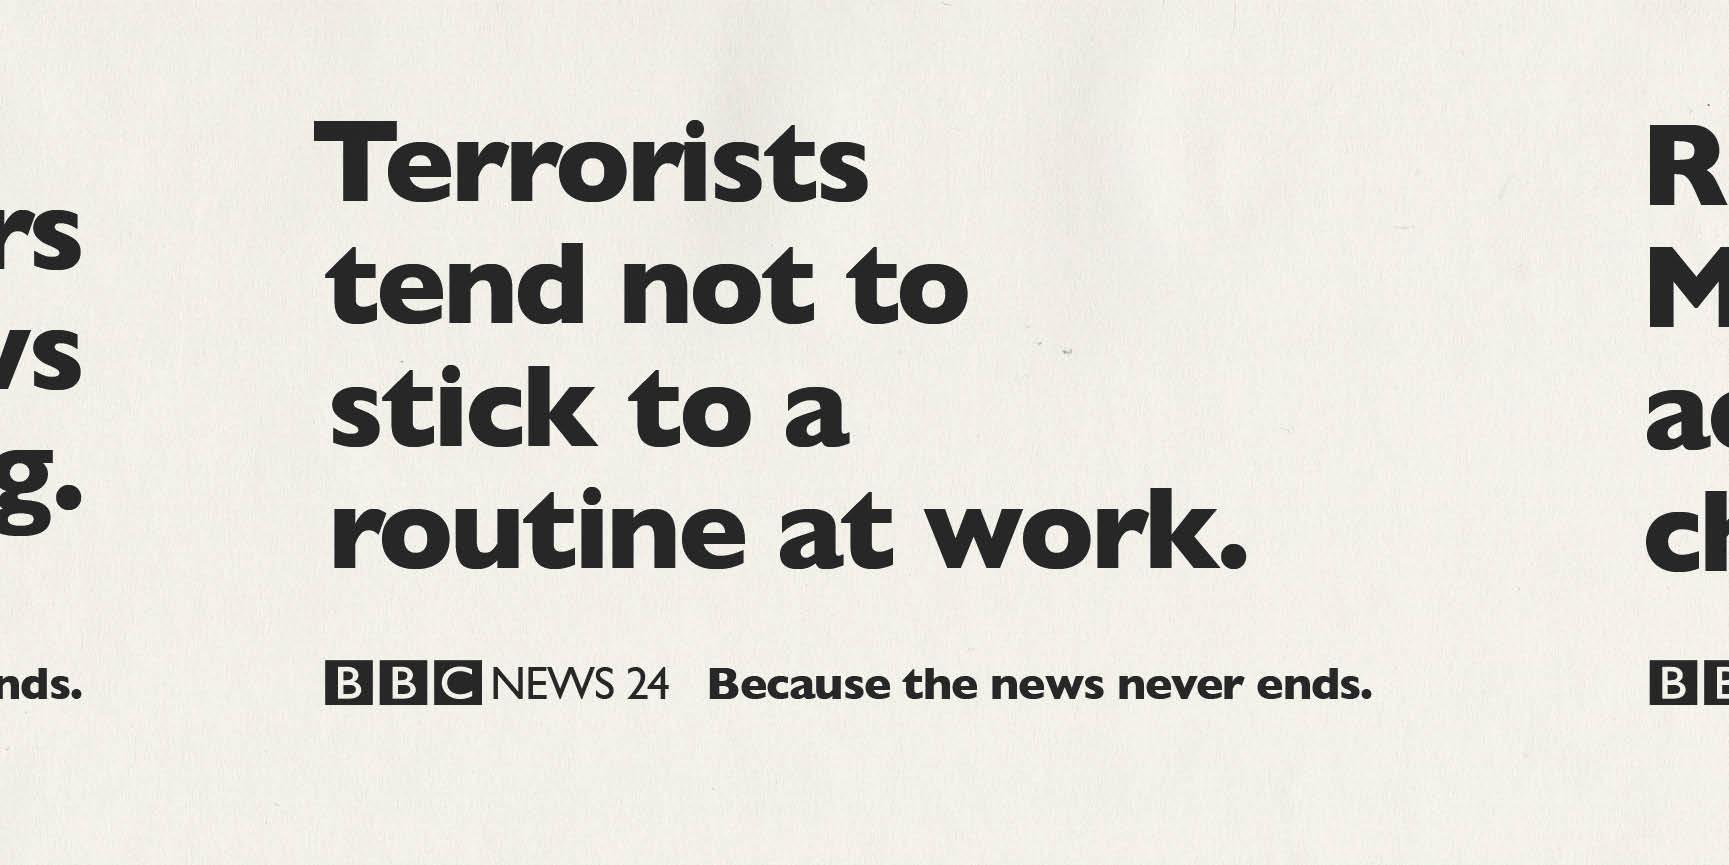 BBC NEWS 244